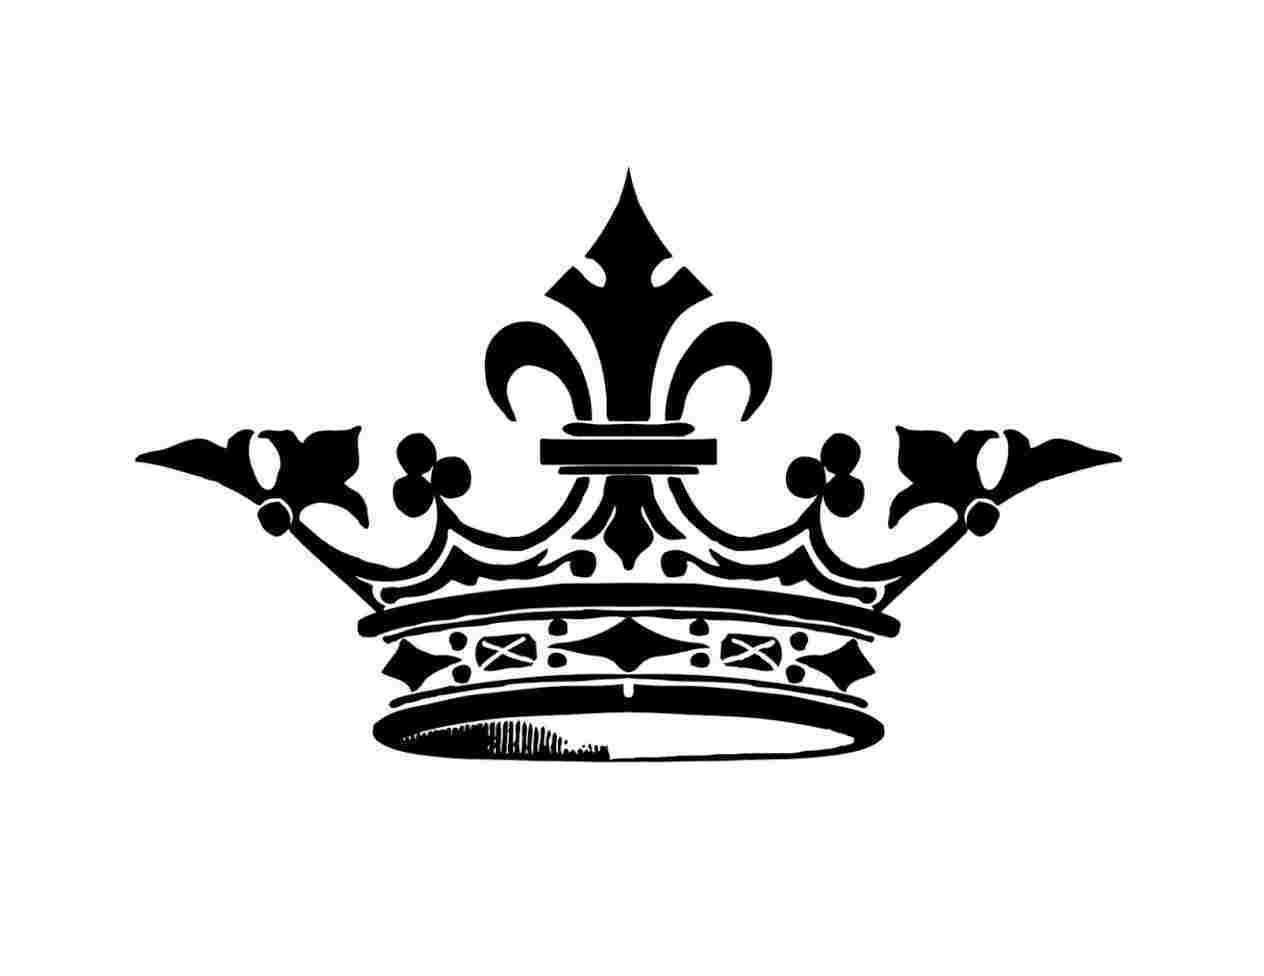 1264x976 Graffiti King Crown Drawing